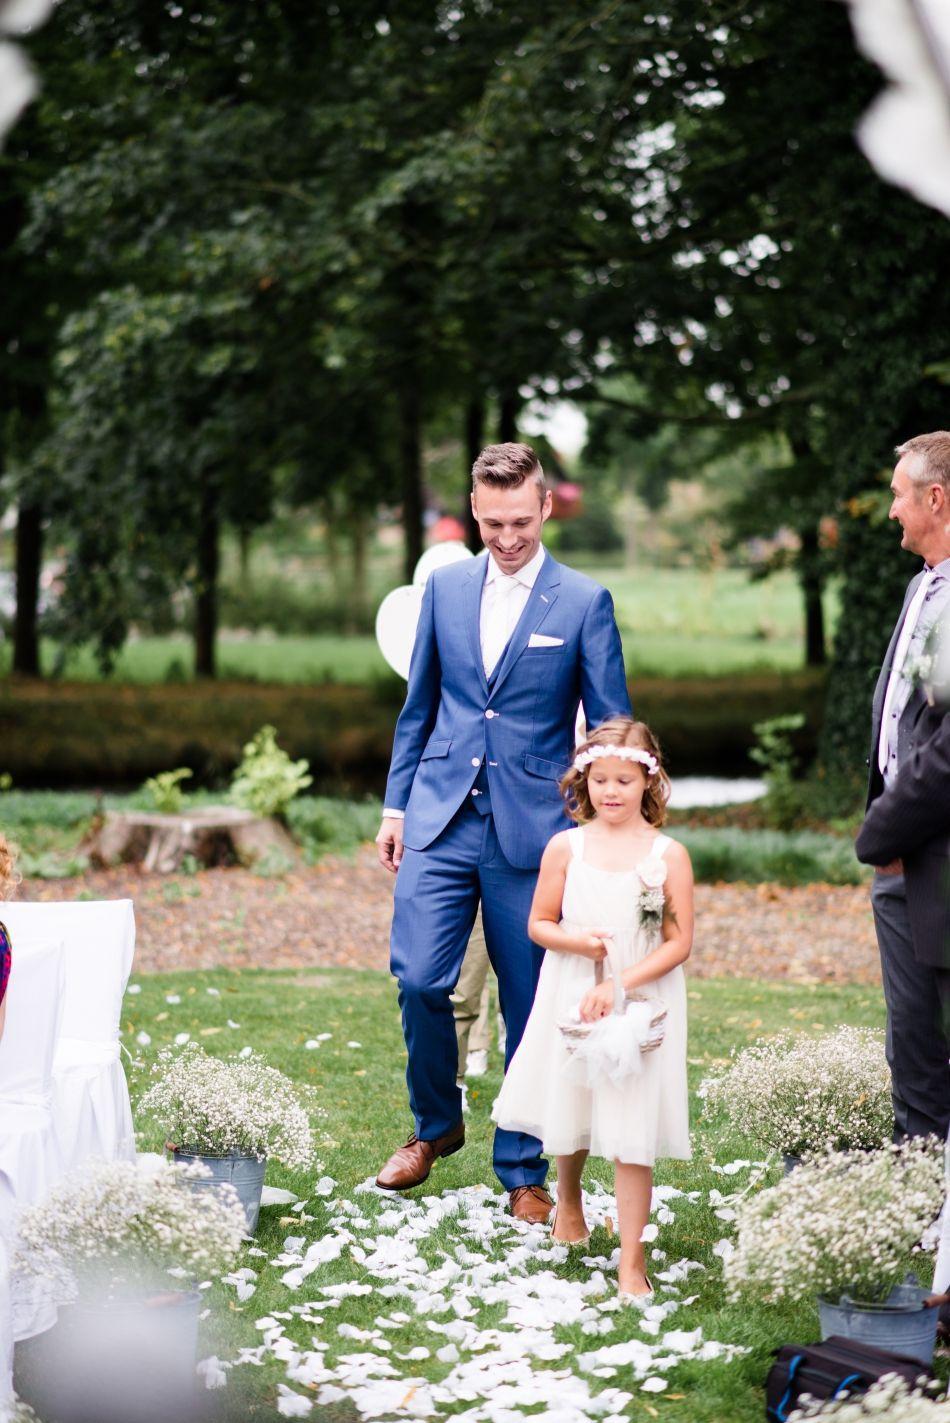 43-bruidsfotografie-landgoed-epemastate-buiten-ceremonie